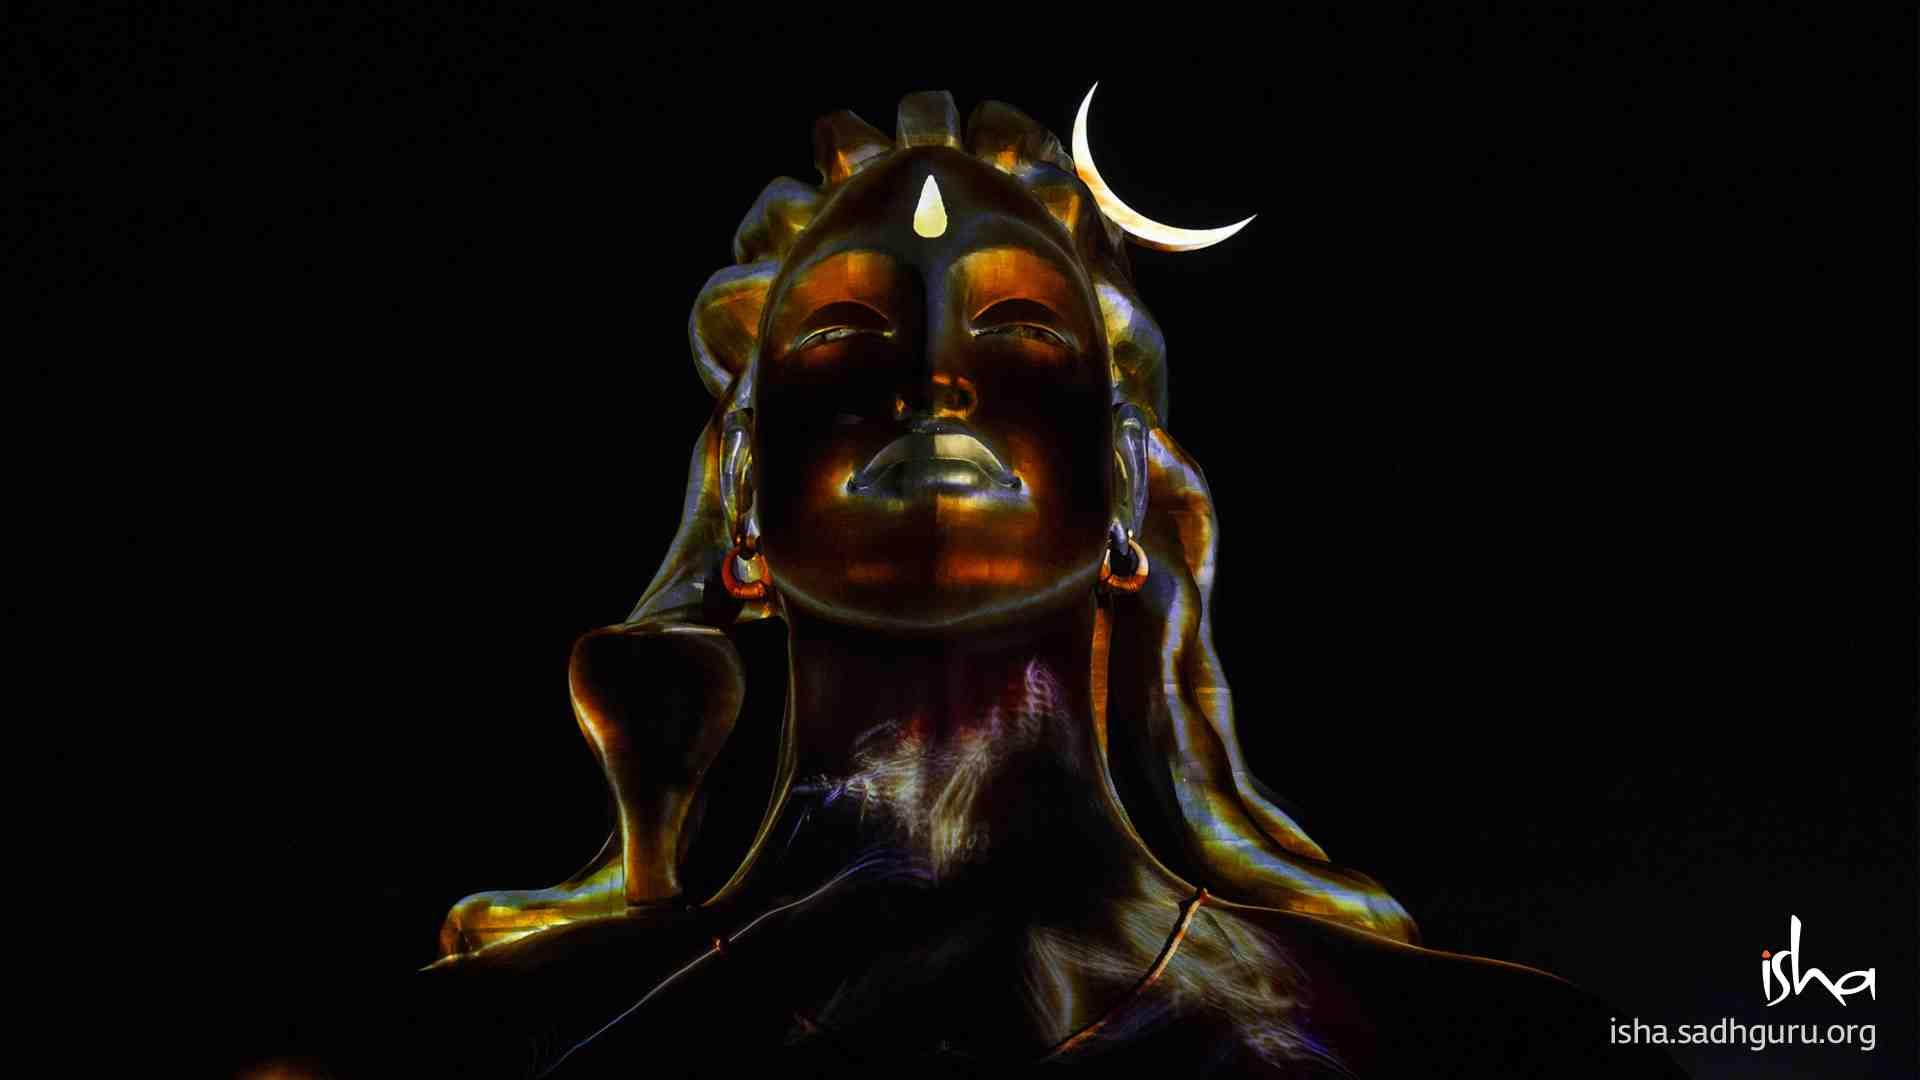 Shiva Wallpaper - Second image from the Adiyogi Divya Darshanam on Mahashivratri